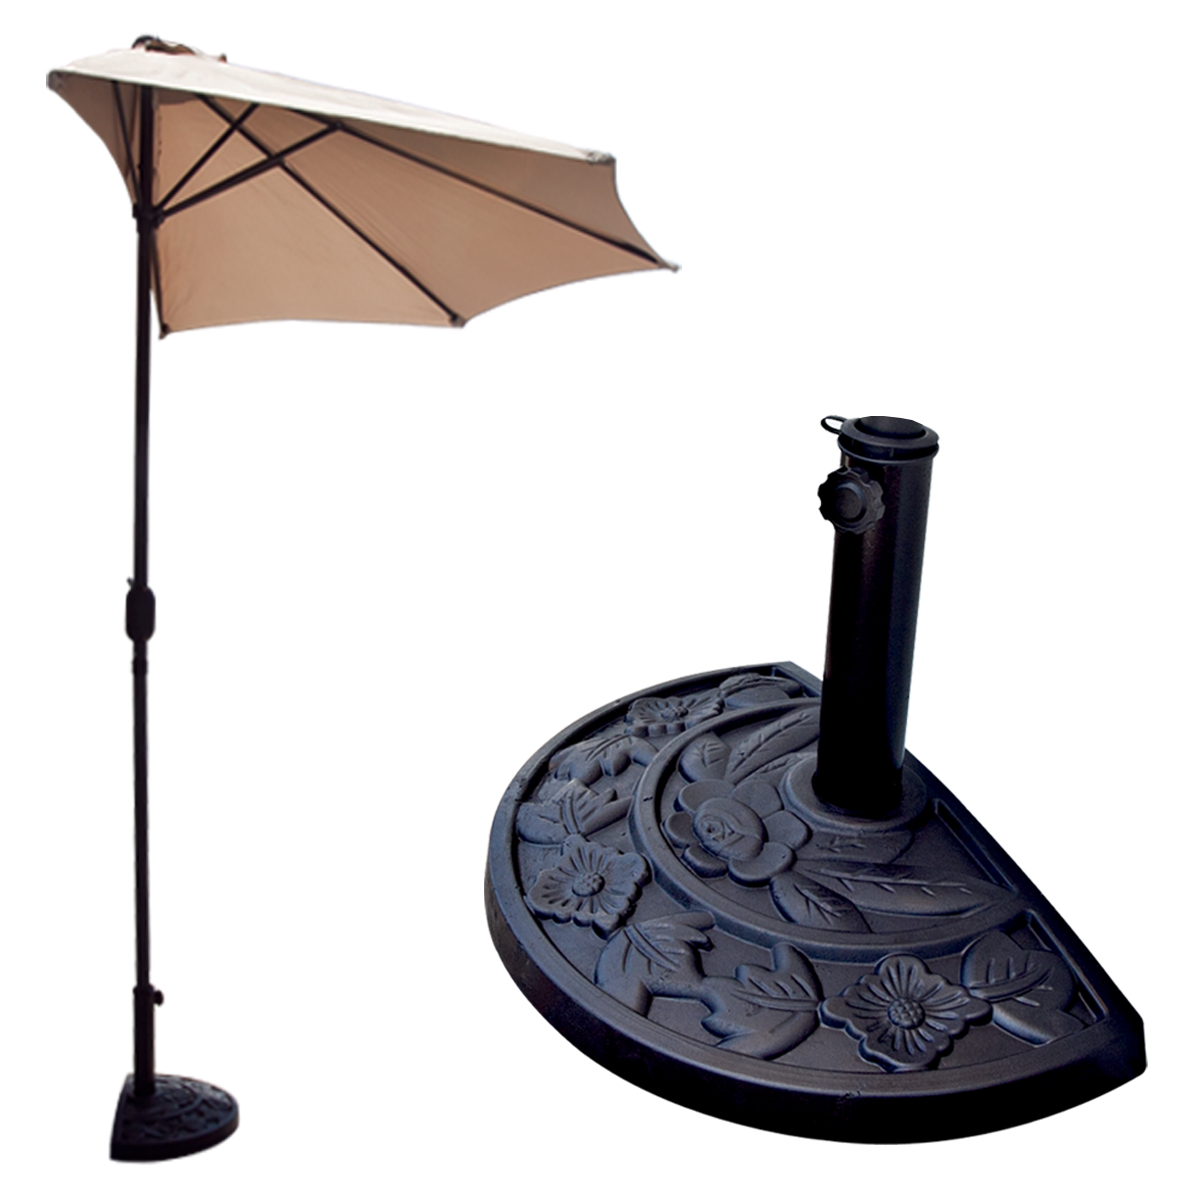 Half patio umbrella